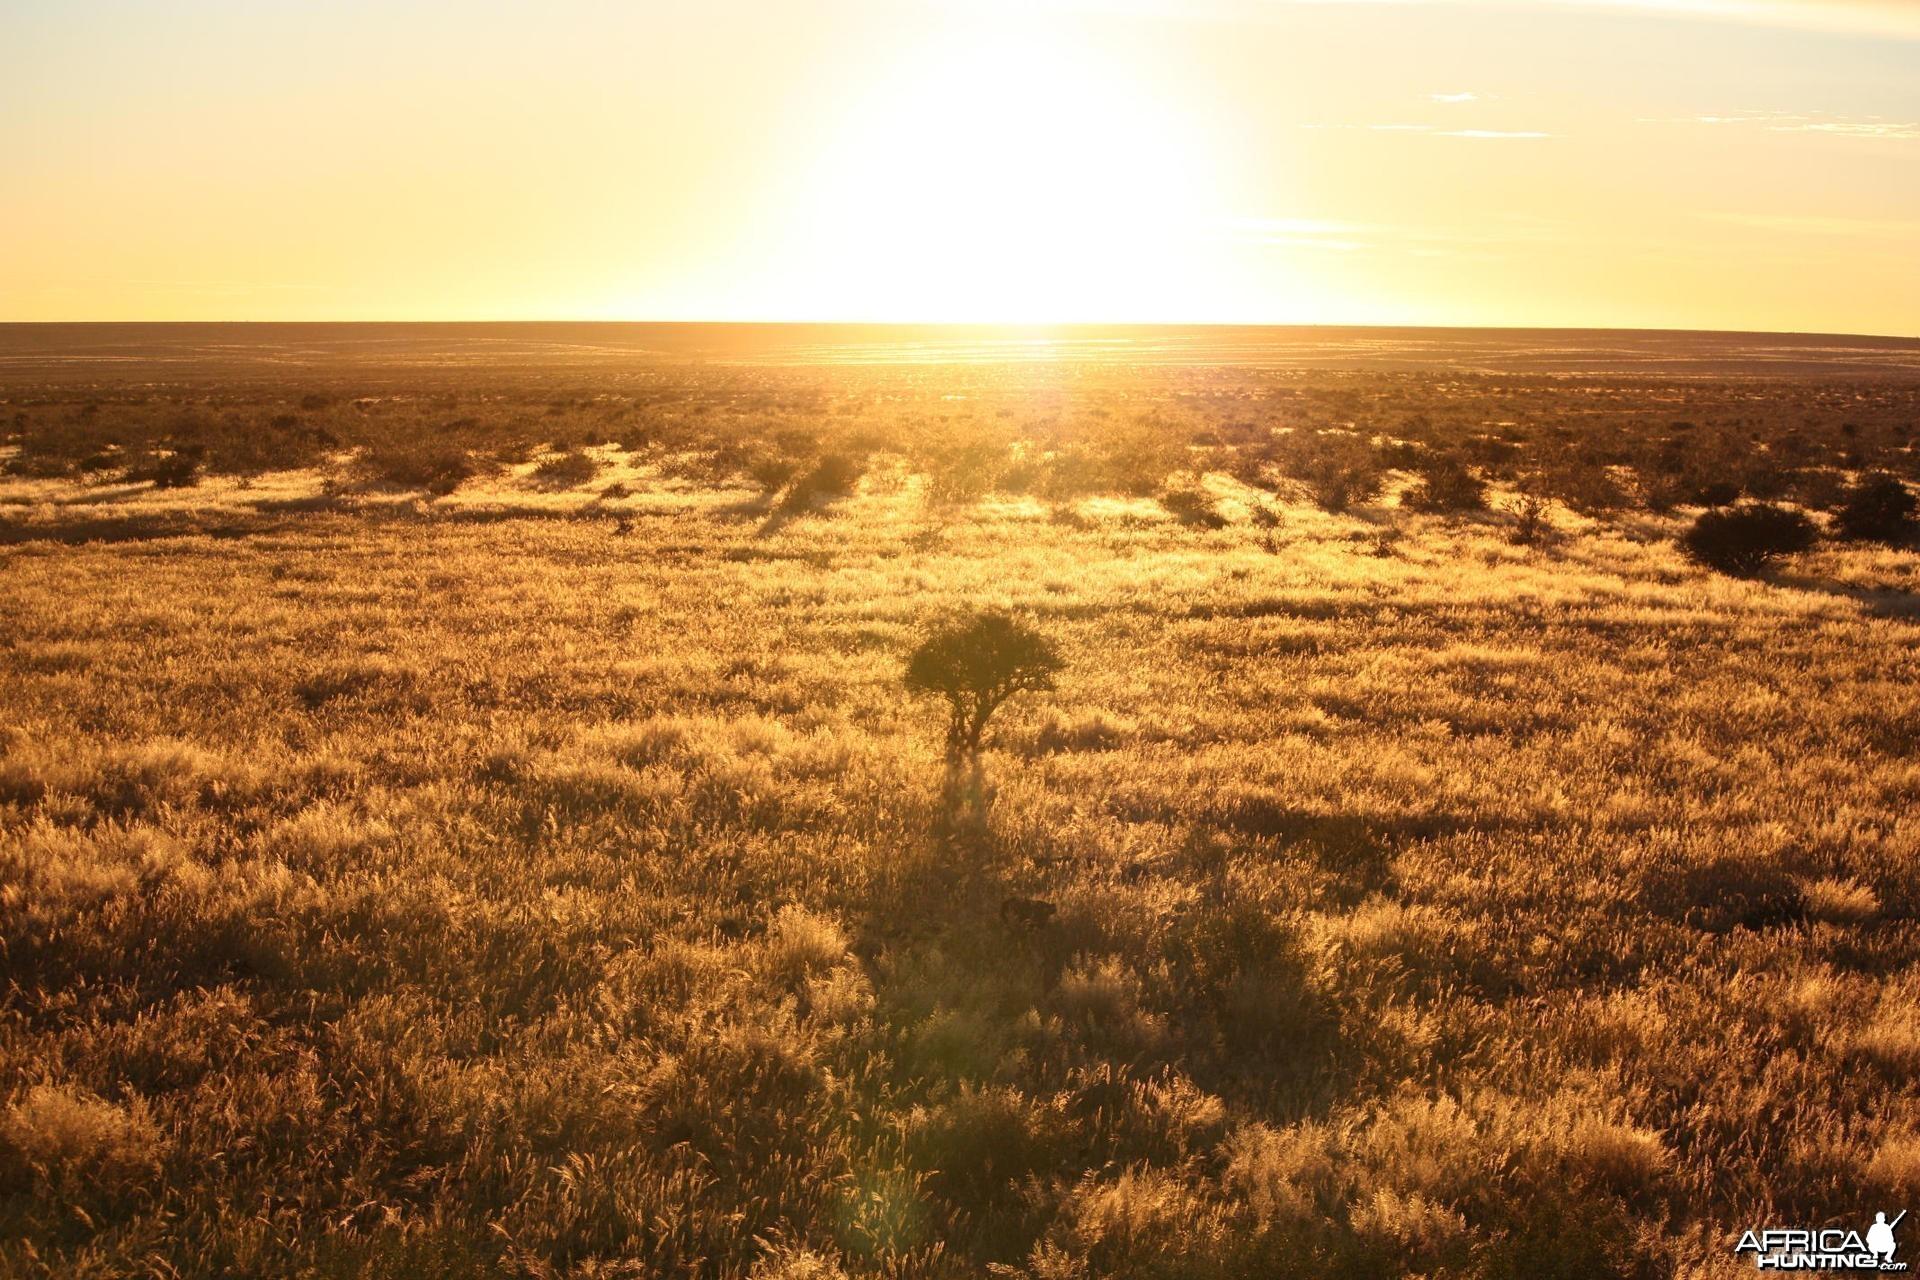 African Sunrises, here at the edge of the Kalahari - always beautiful